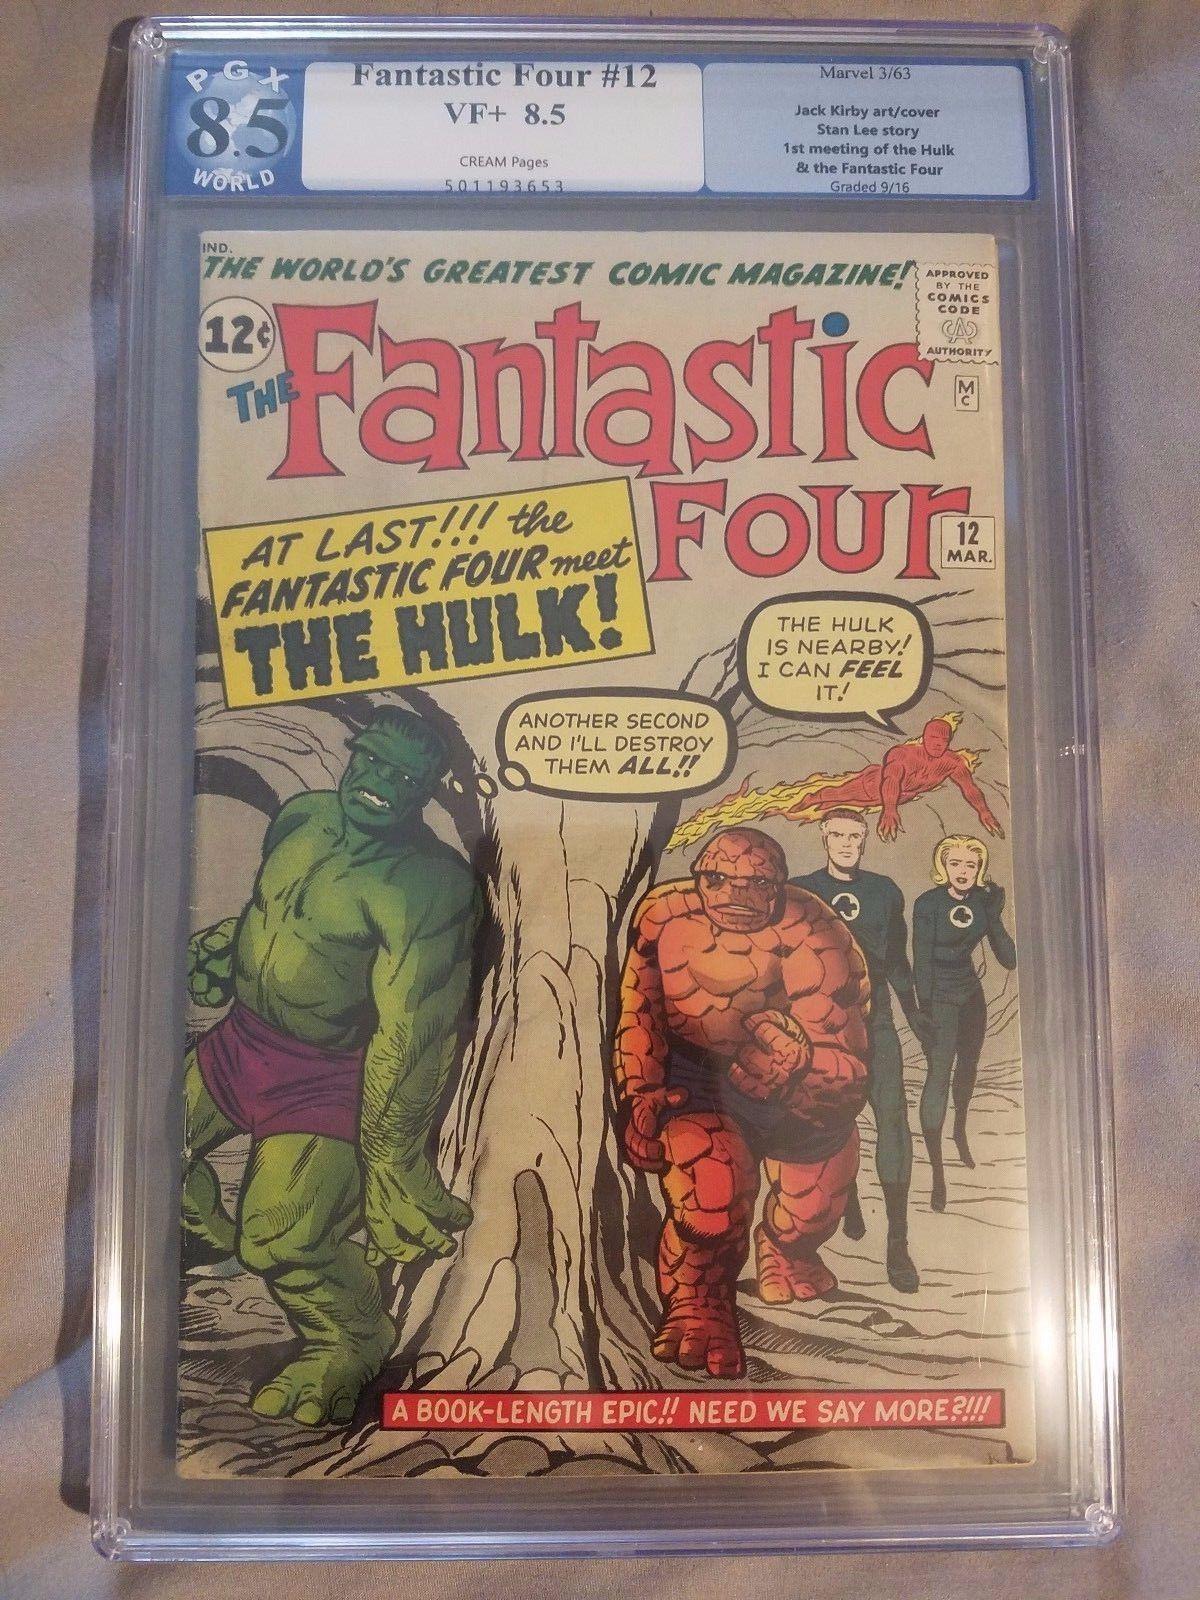 Fantastic Four 12 Marvel 1963 PGX 8.5 1st Meeting Hulk & Fantastic Four